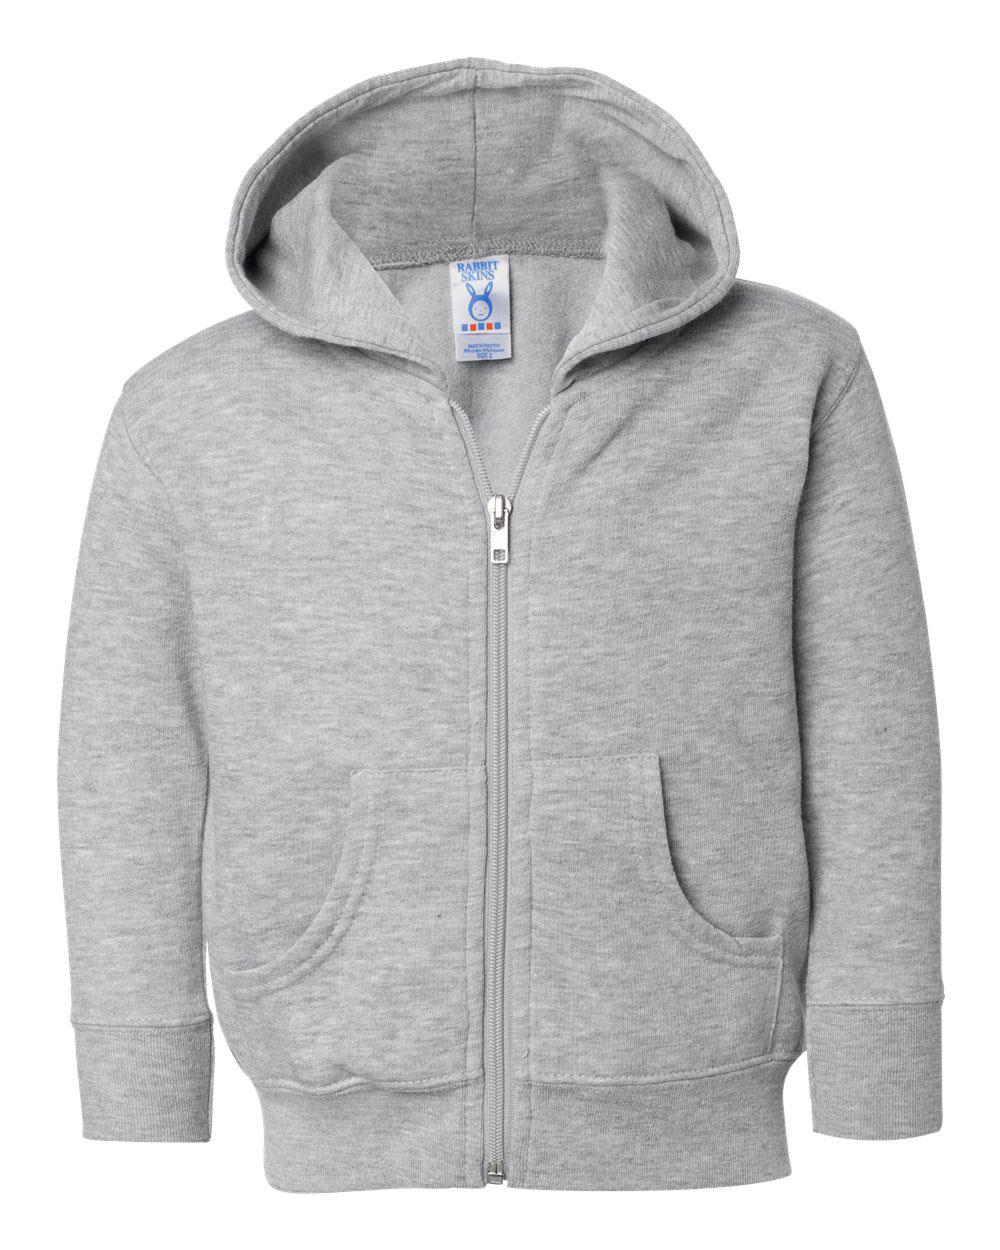 Rabbit Skins Infant Fleece Long Sleeve Full Zip Hooded Sweatshirt with Pouch Pockets